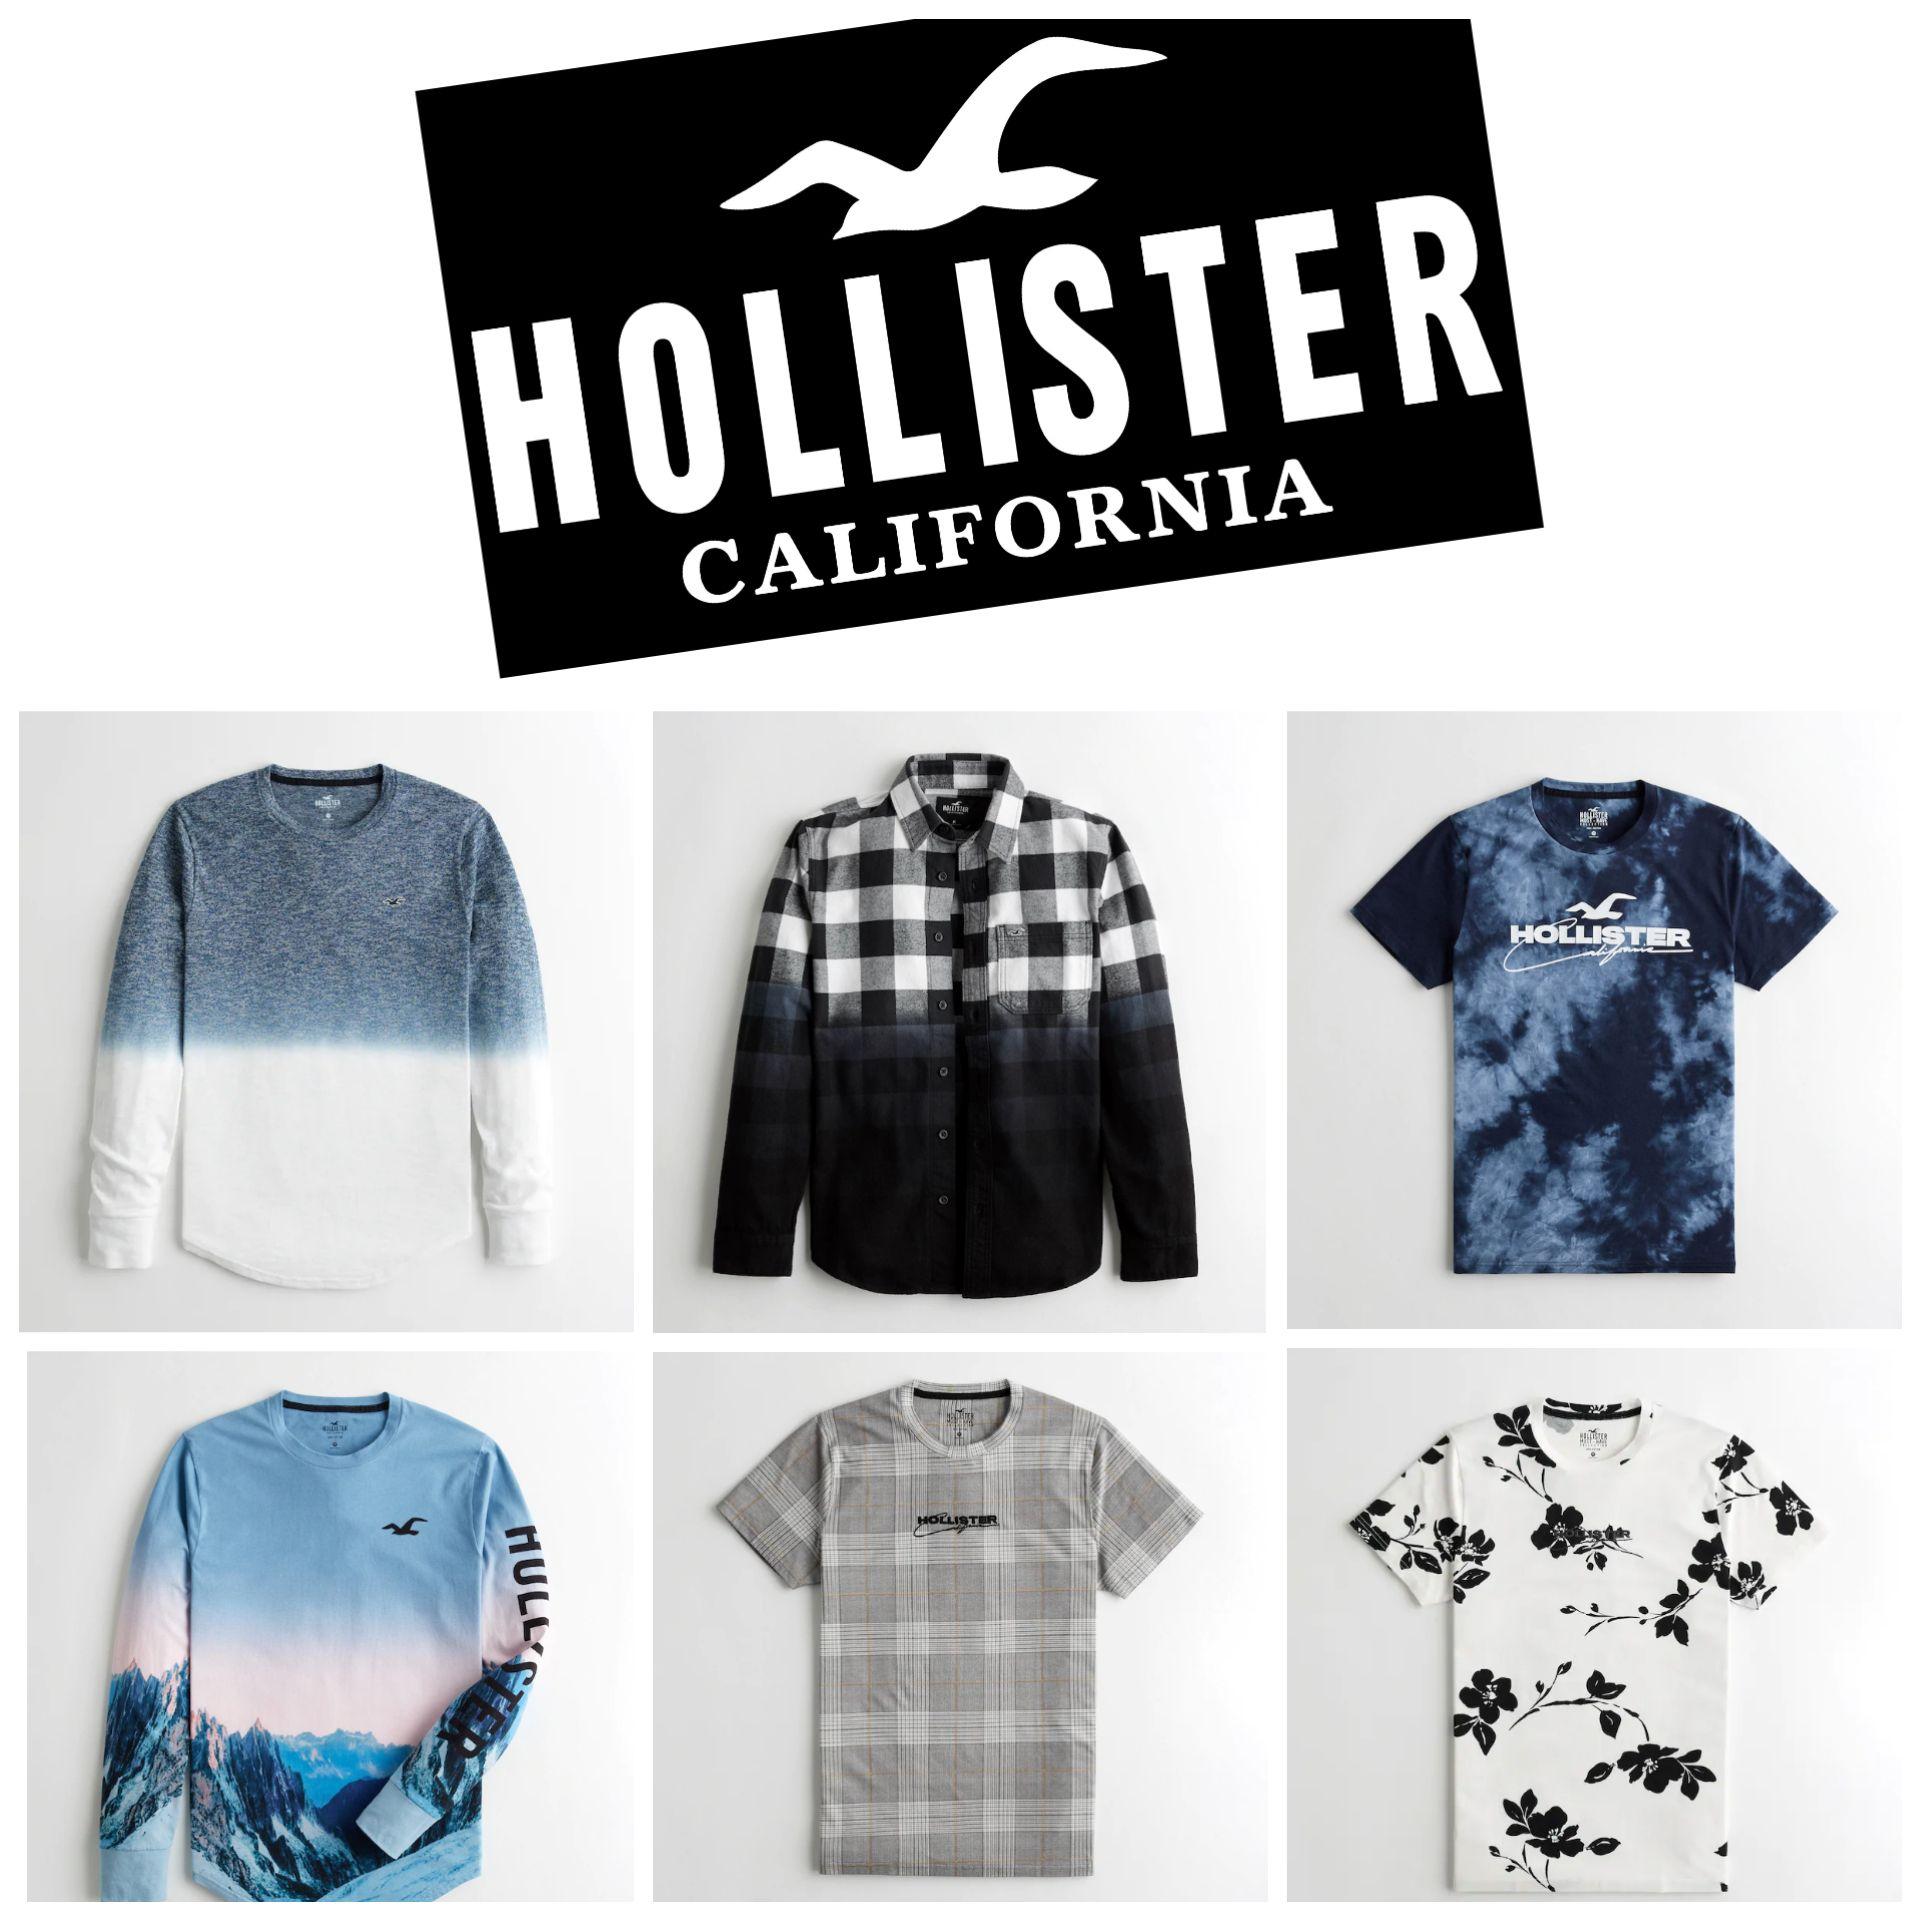 Camisetas Hollister para Hombre (por menos de 10€)